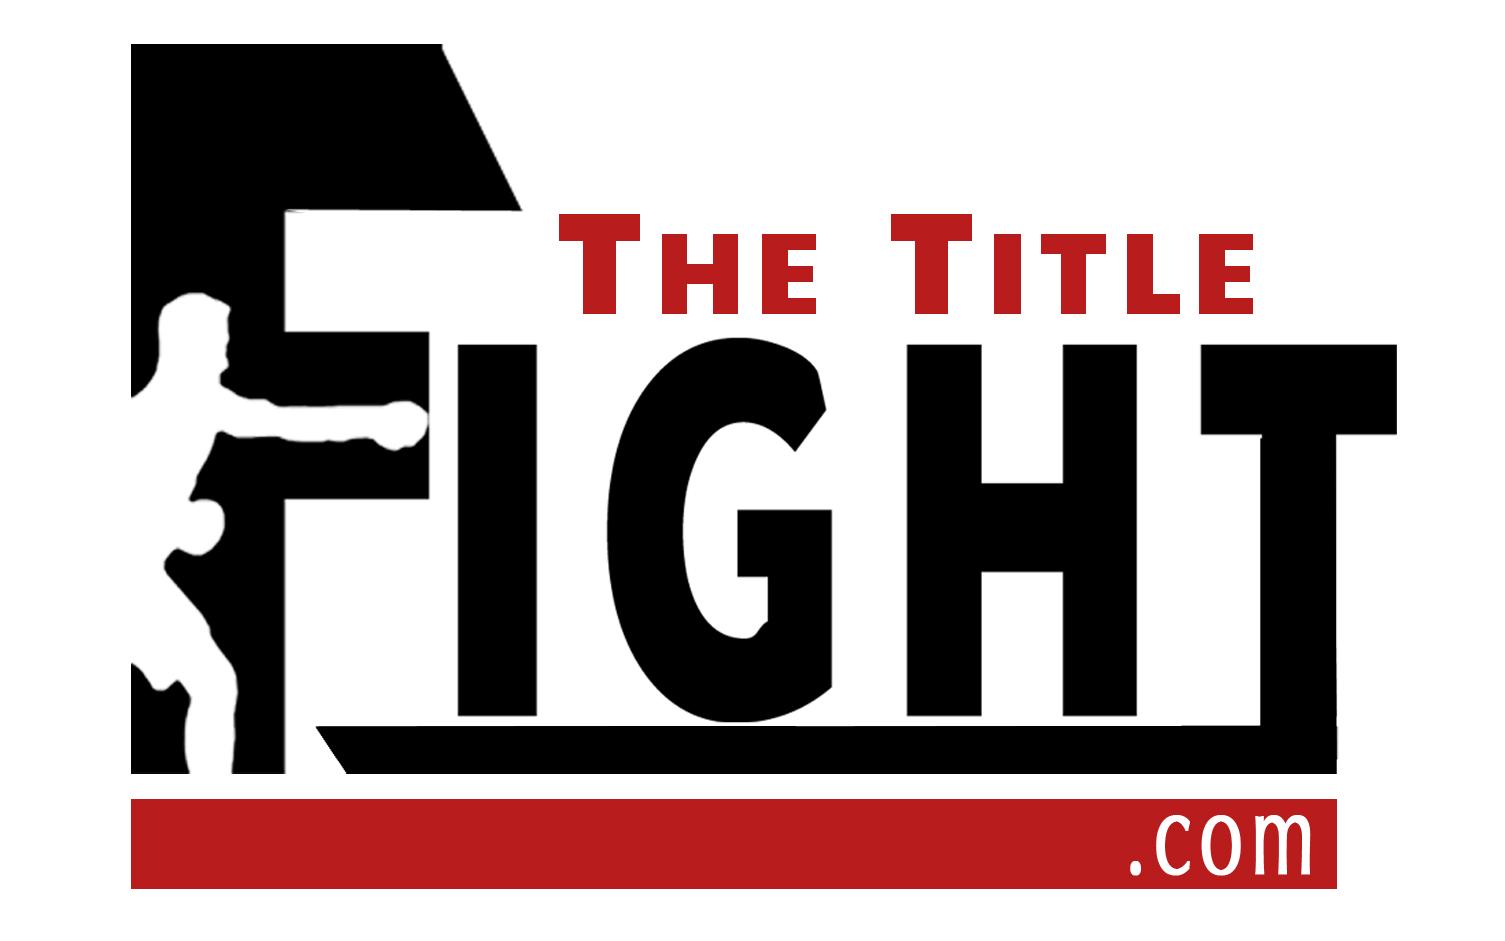 TheTitleFight.com